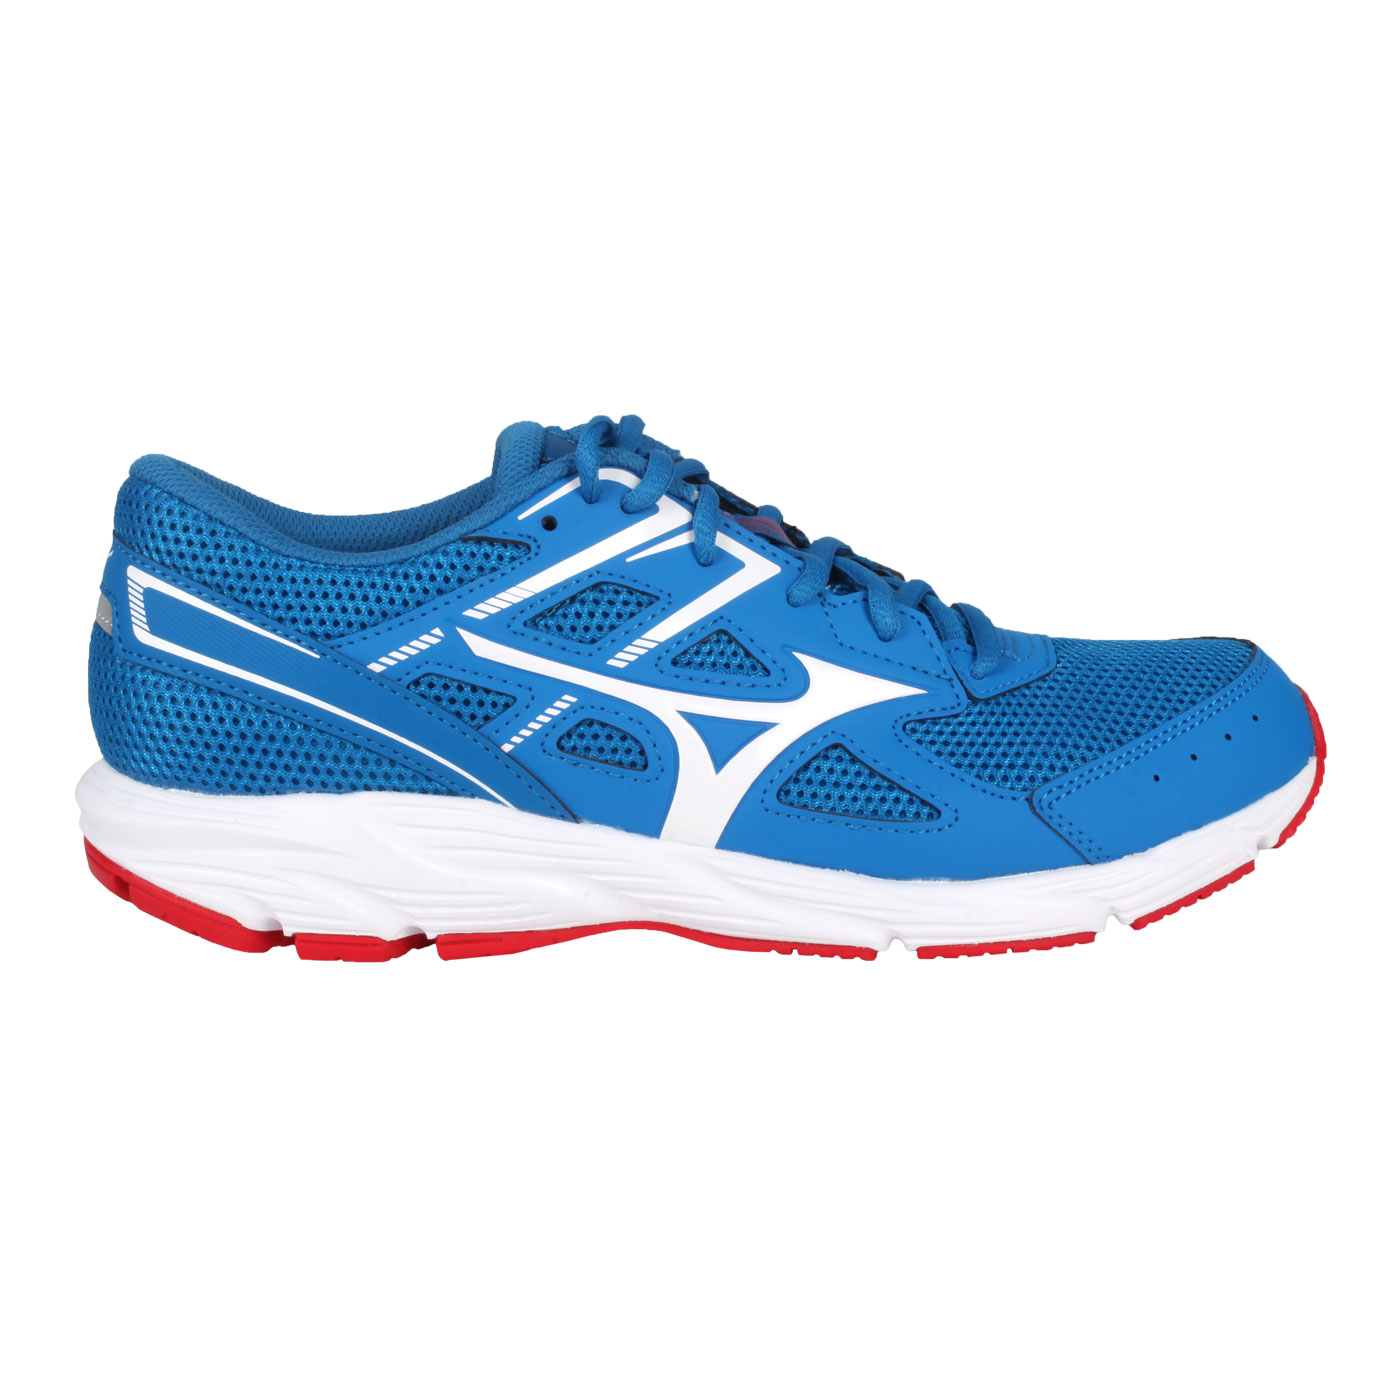 MIZUNO 男款慢跑鞋  @ SPARK 6@K1GA210302 - 藍白紅